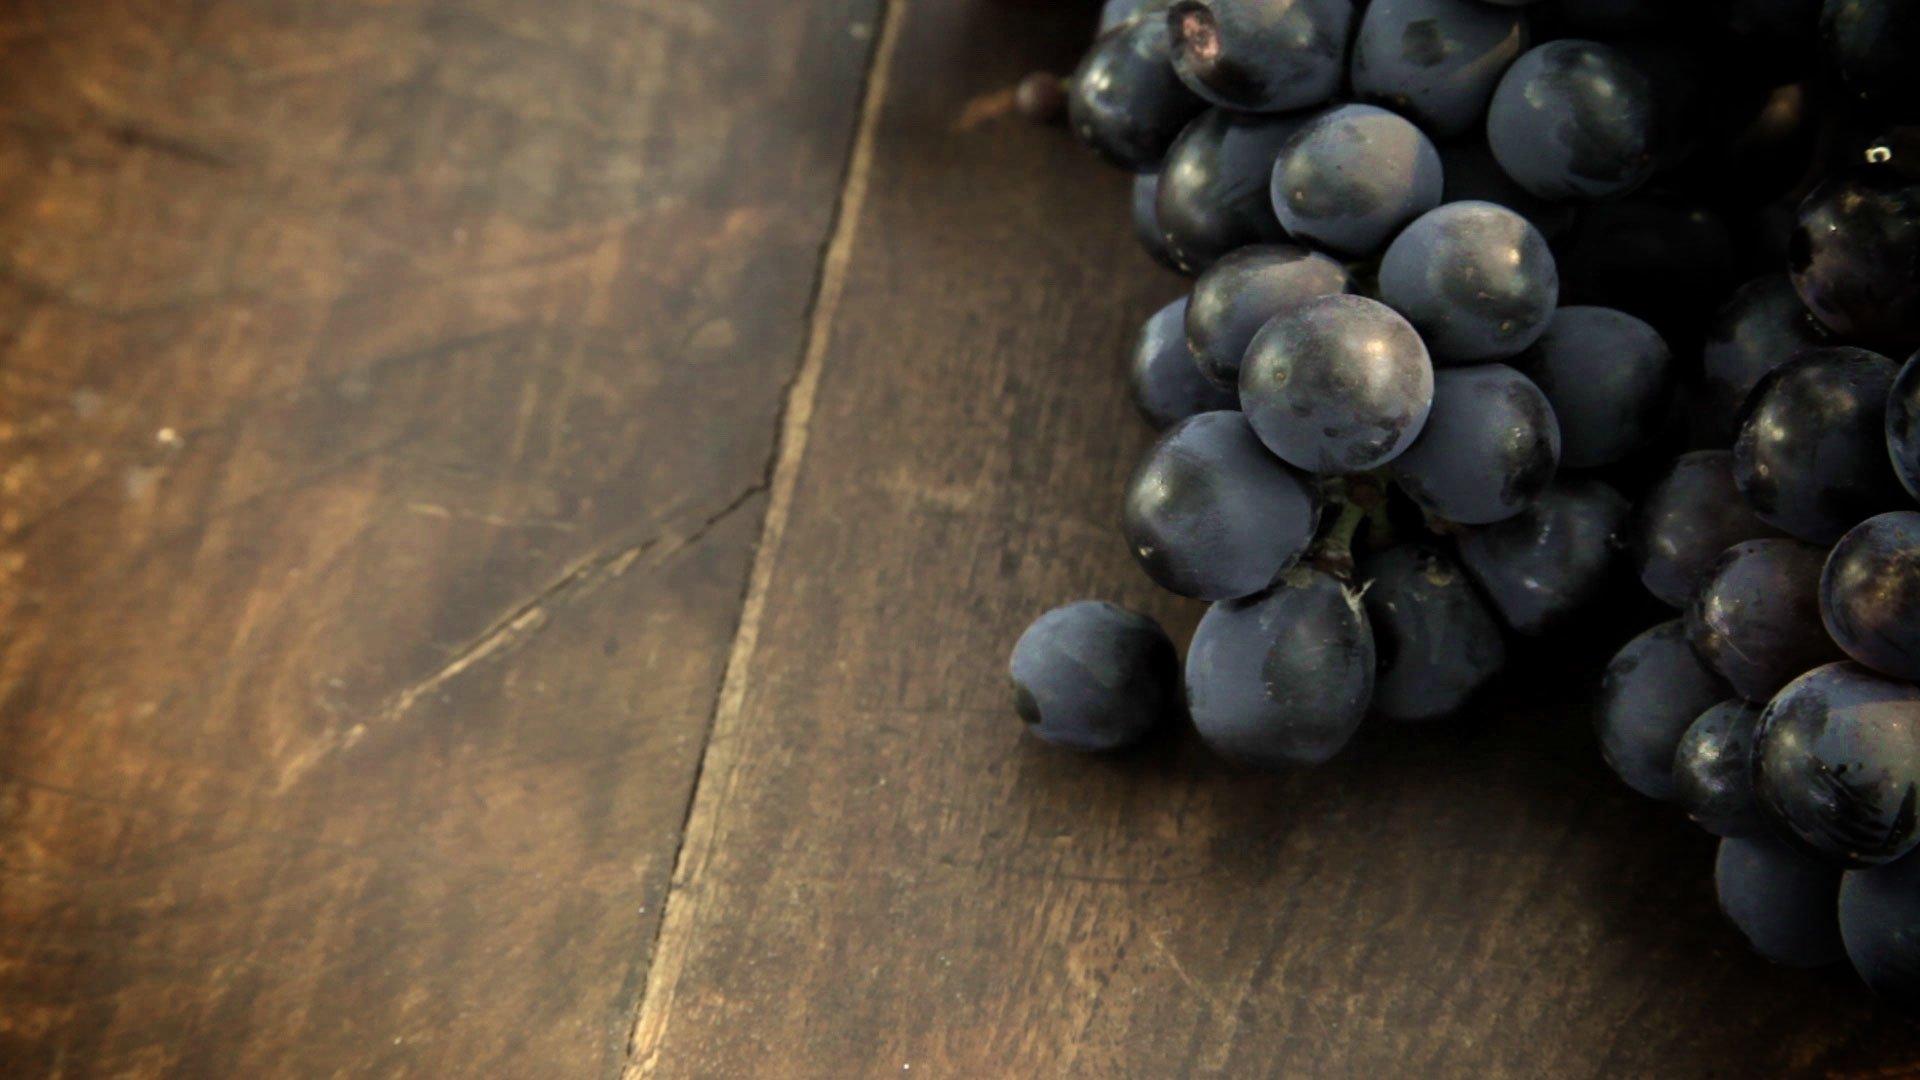 Vini uva